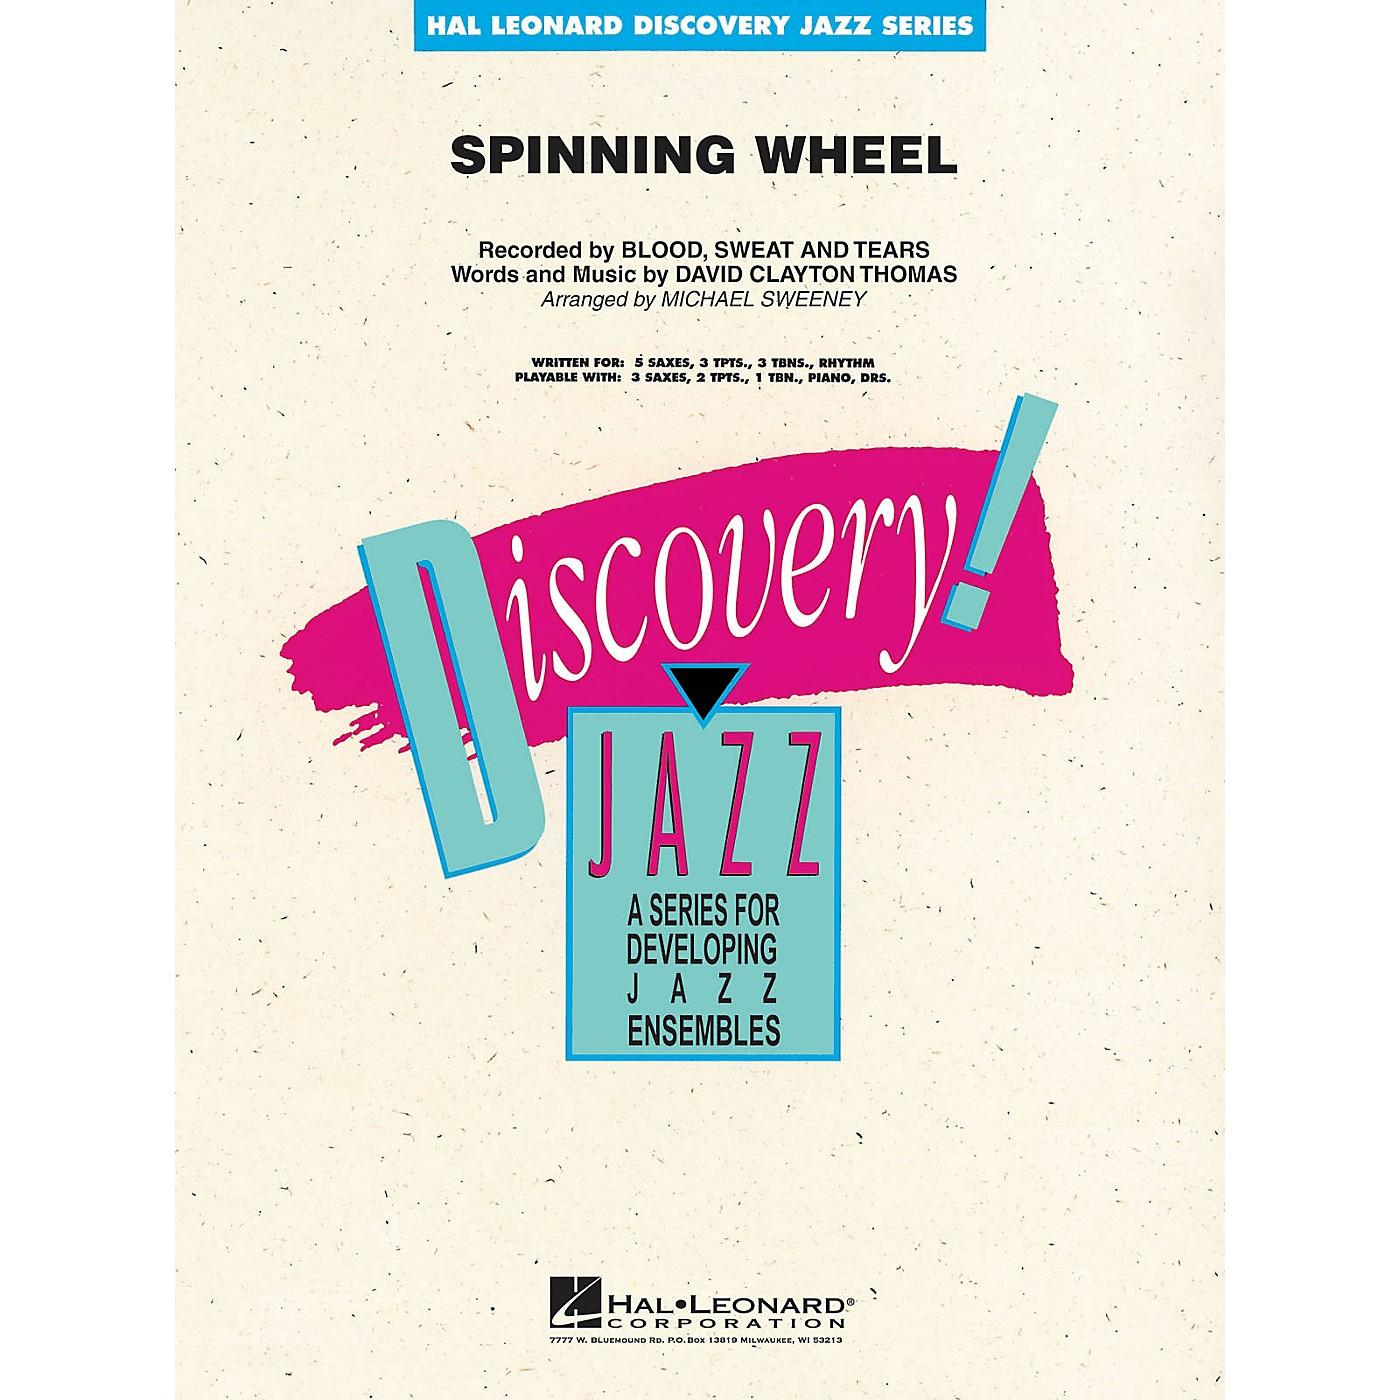 Hal Leonard Spinning Wheel Jazz Band Level 1-2 by Blood, Sweat & Tears Arranged by Michael Sweeney thumbnail